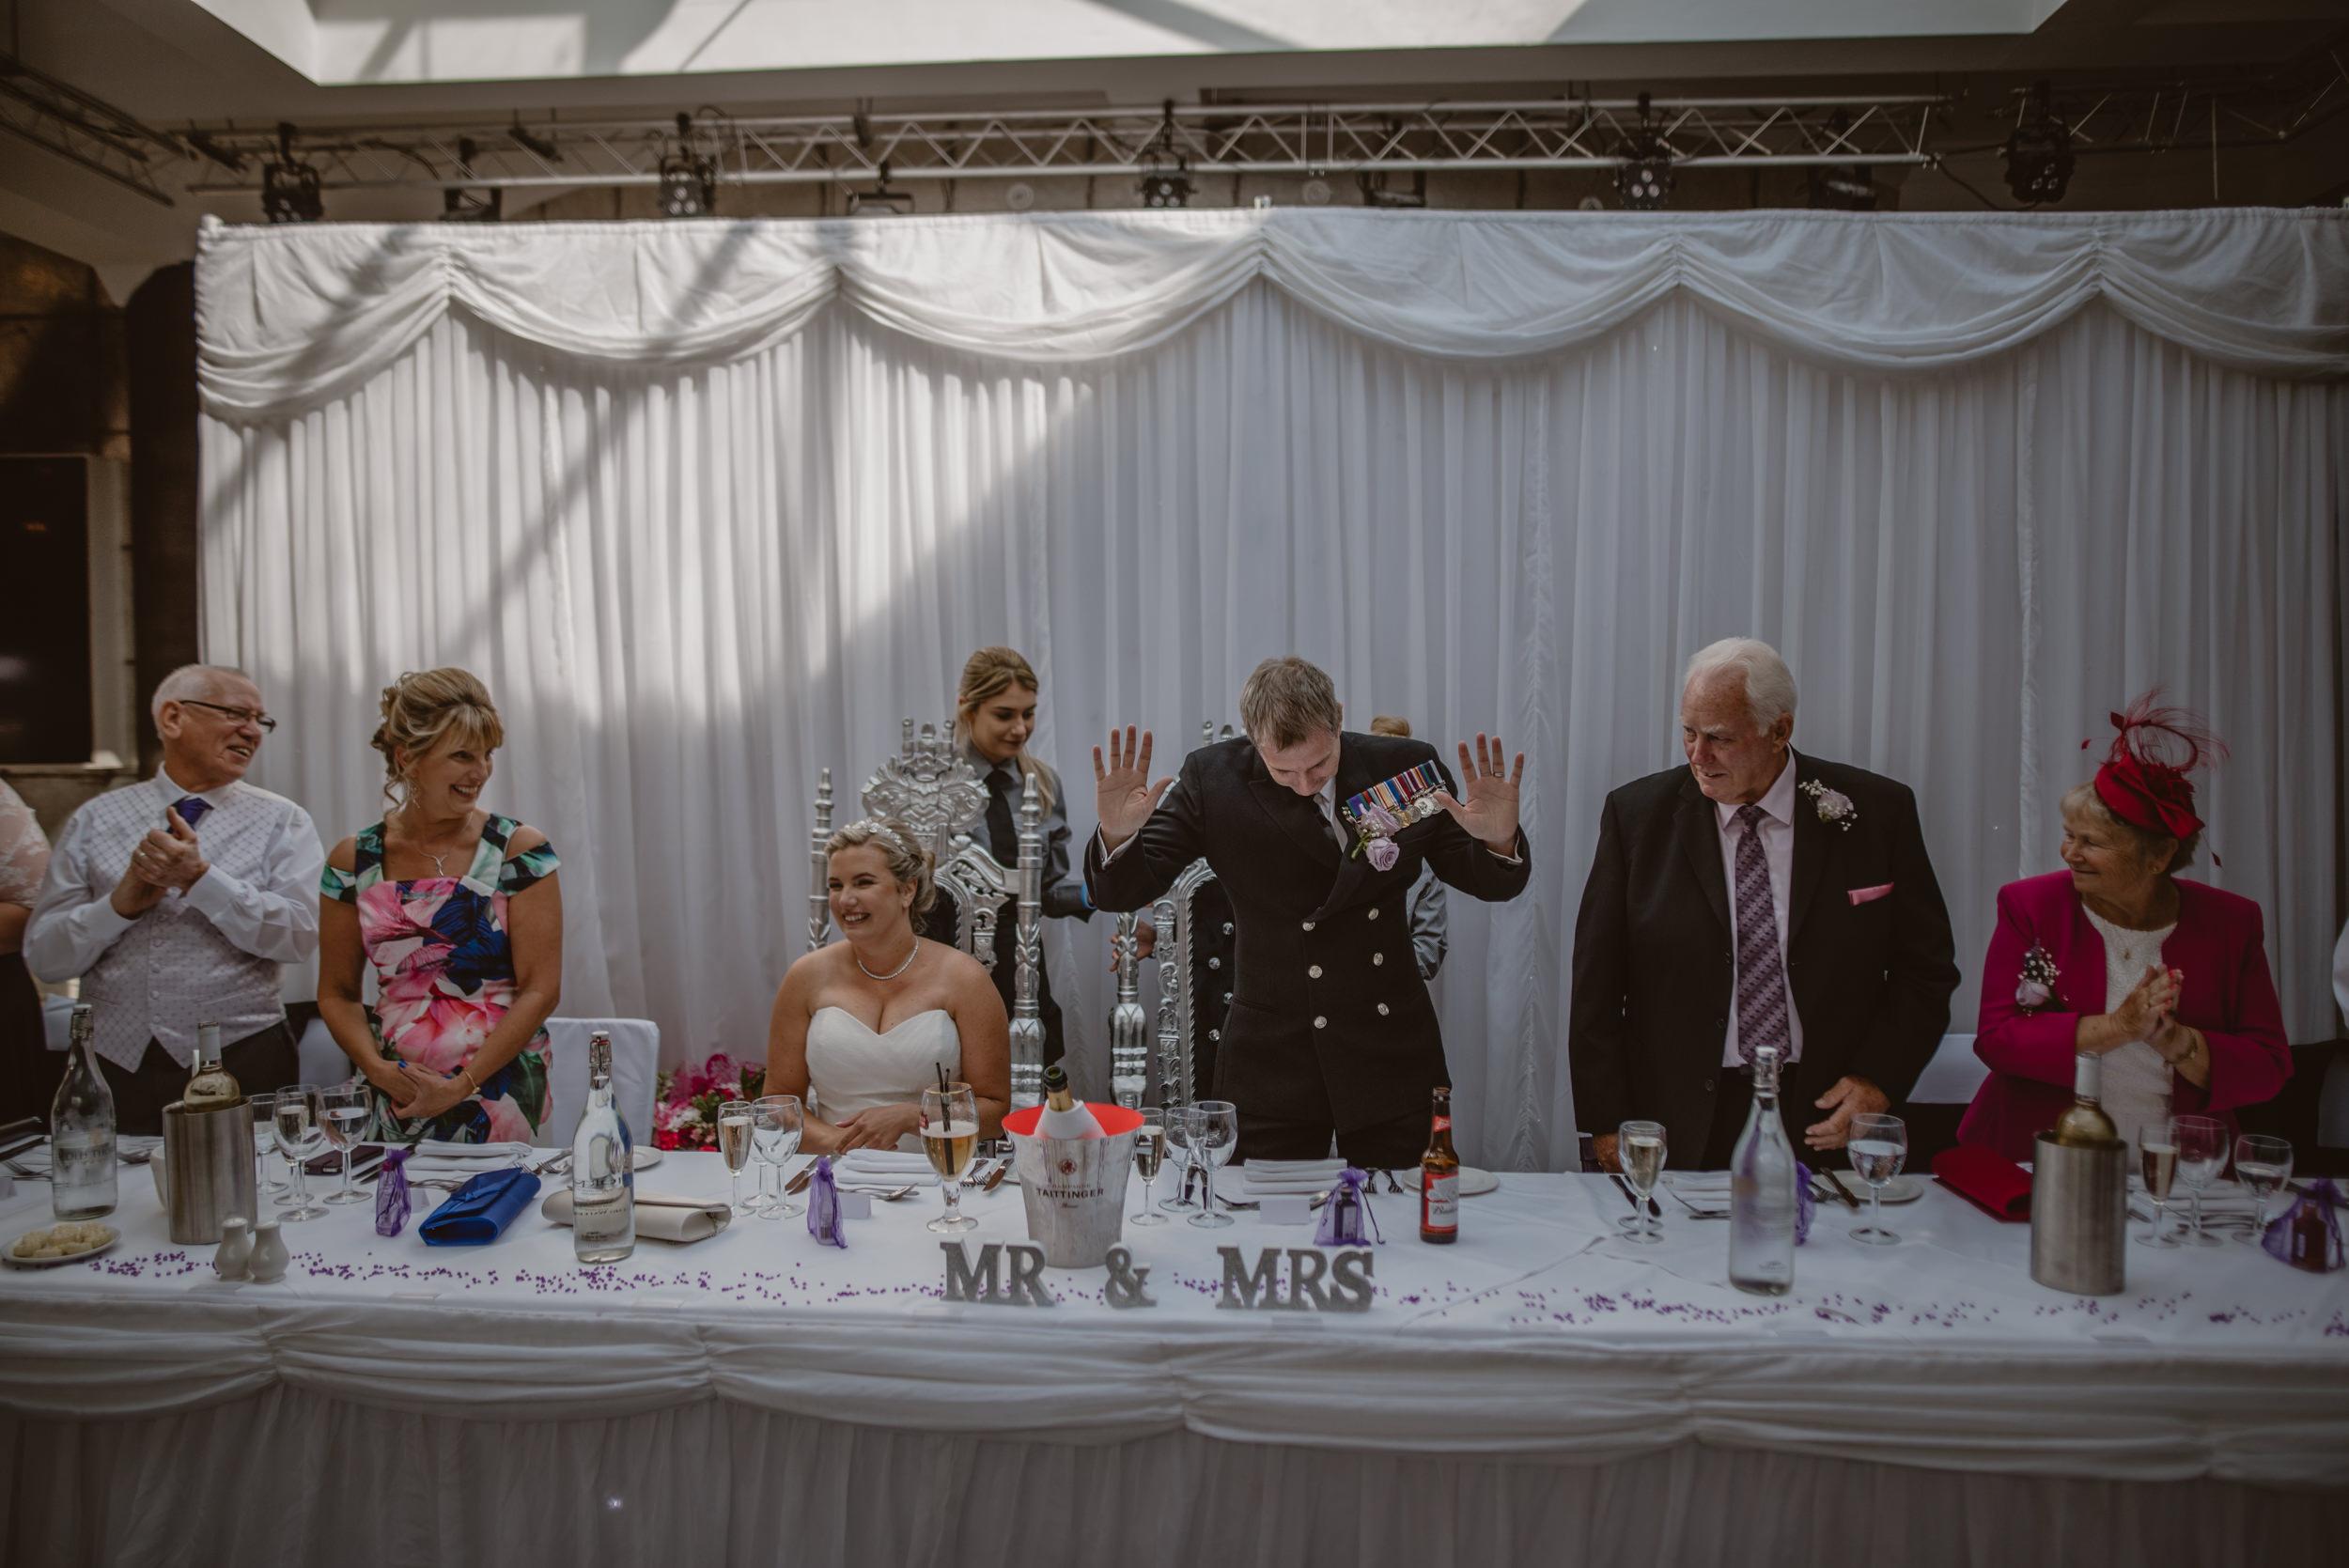 Chantelle-and-Stephen-Old-Thorns-Hotel-Wedding-Liphook-Manu-Mendoza-Wedding-Photography-346.jpg